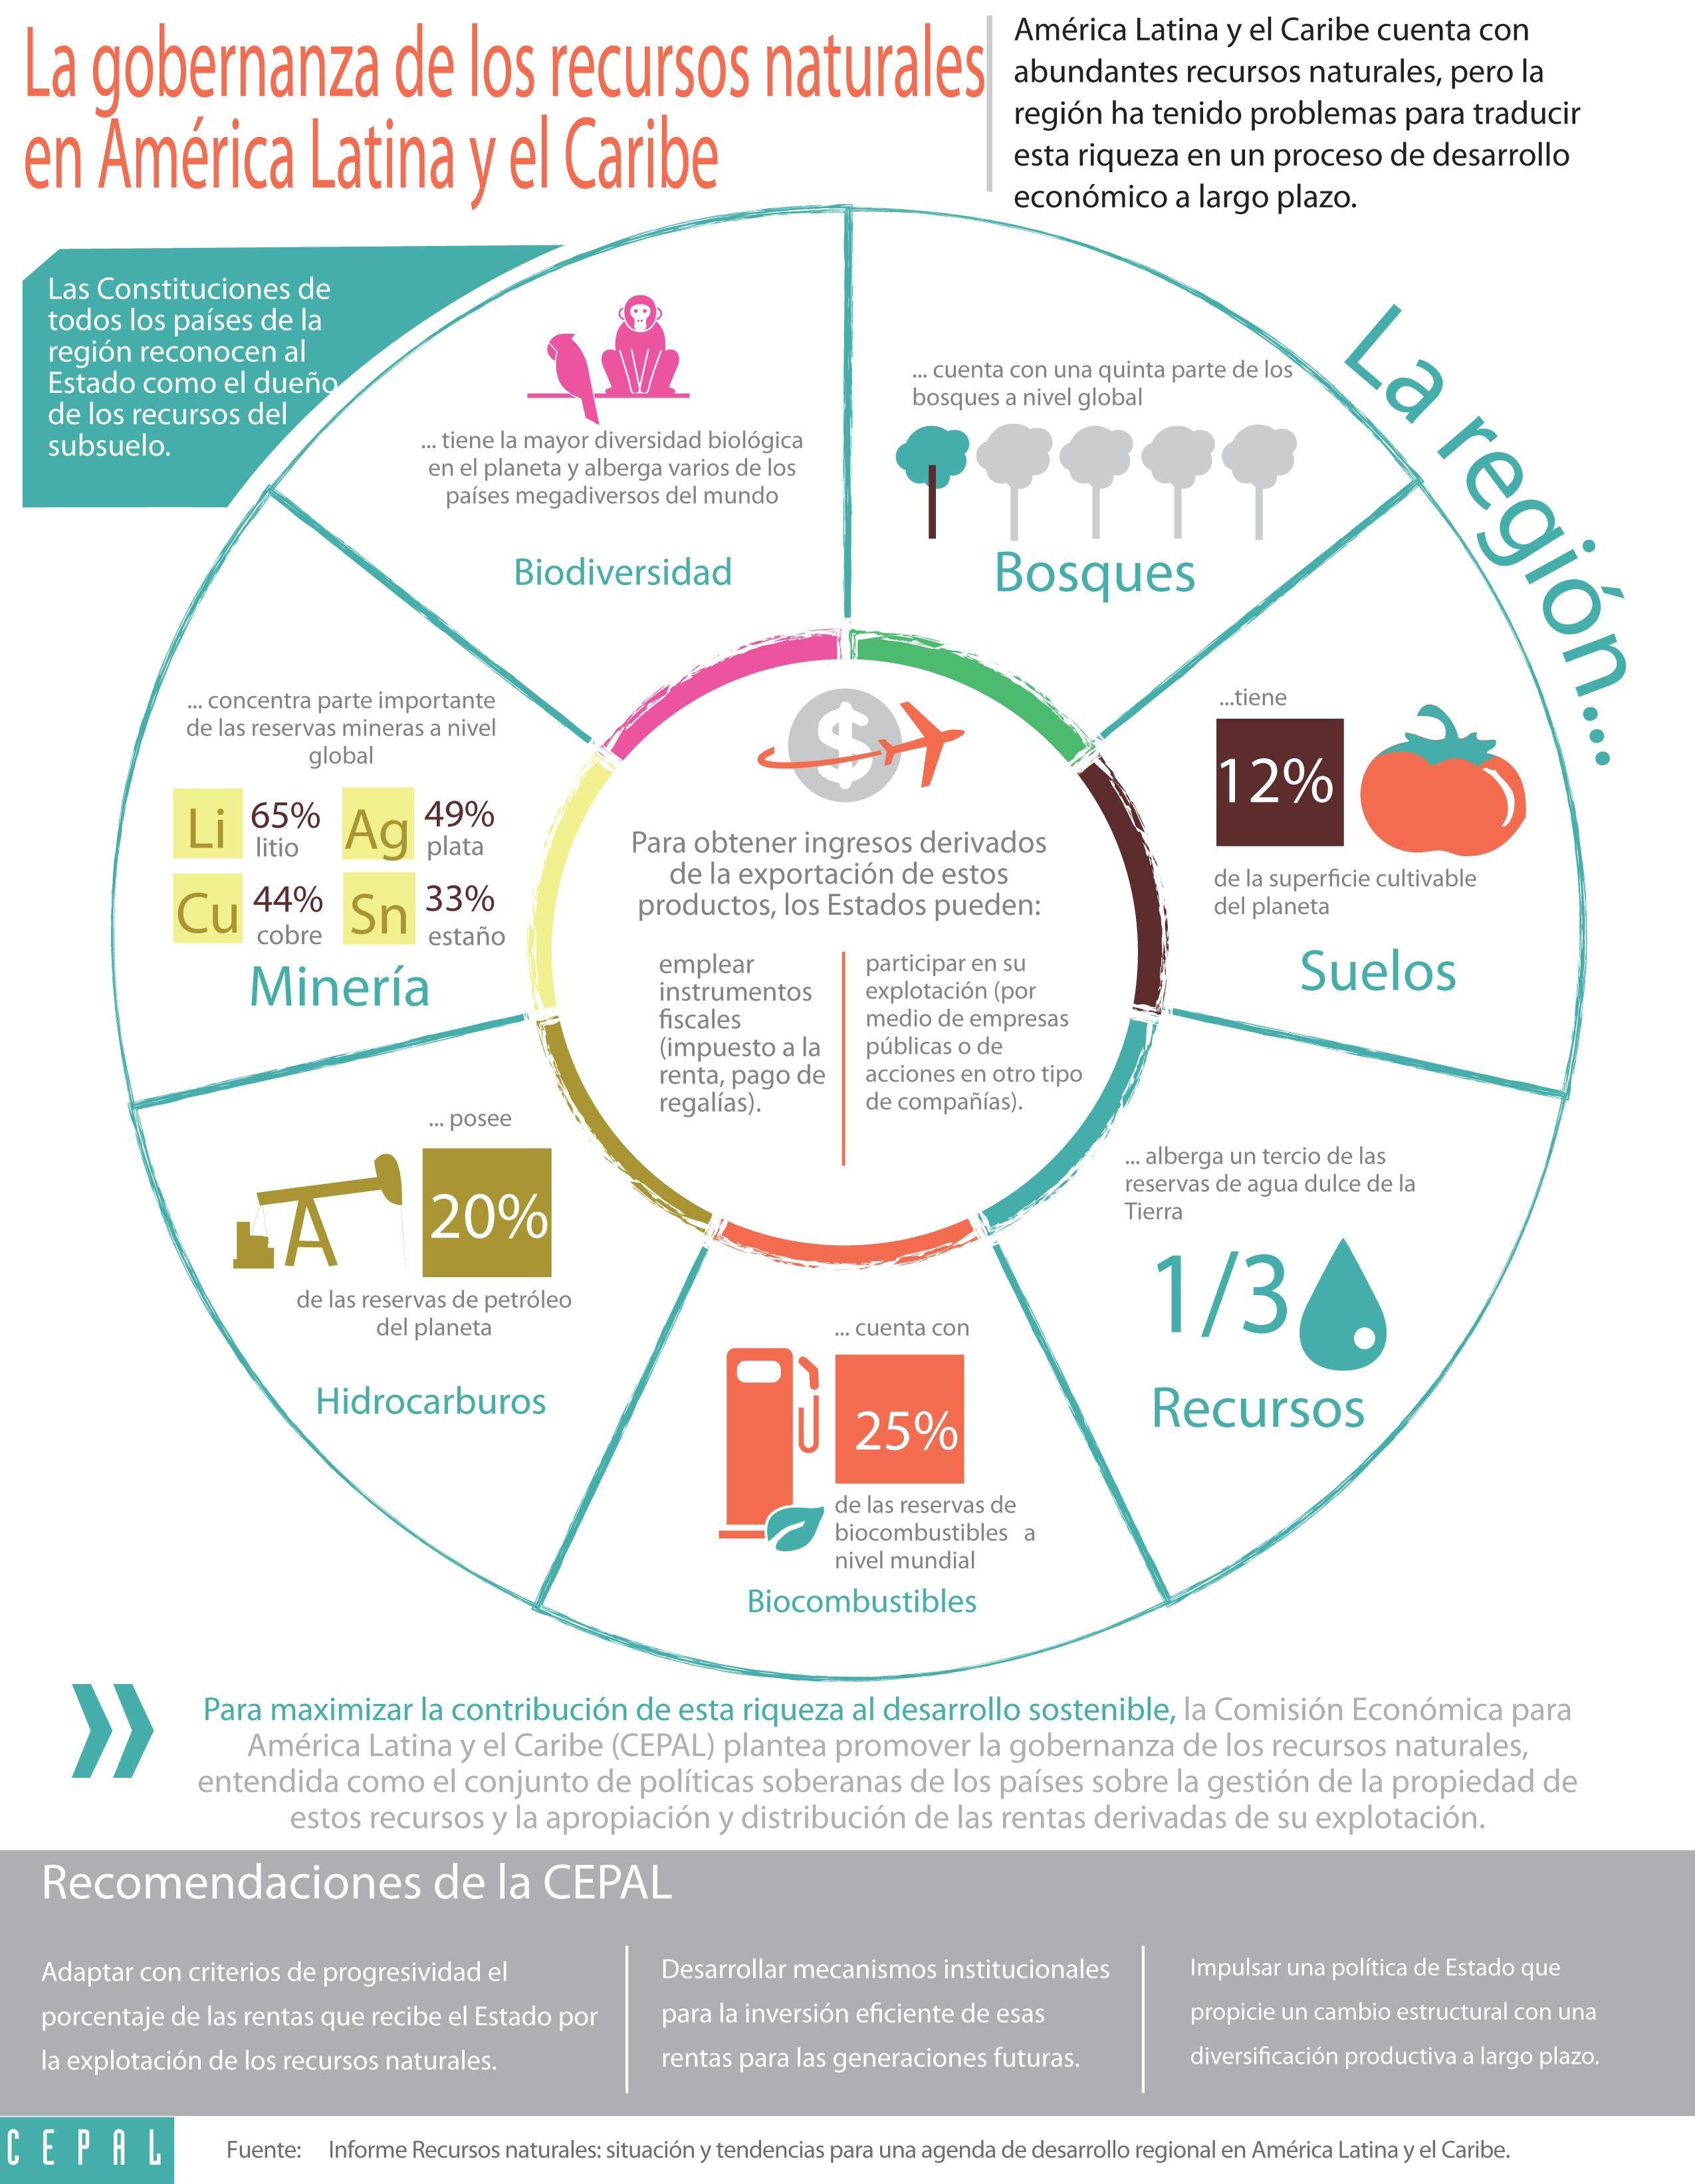 Imagen De La Infograf 237 A Sobre Gobernanza De Los Recursos